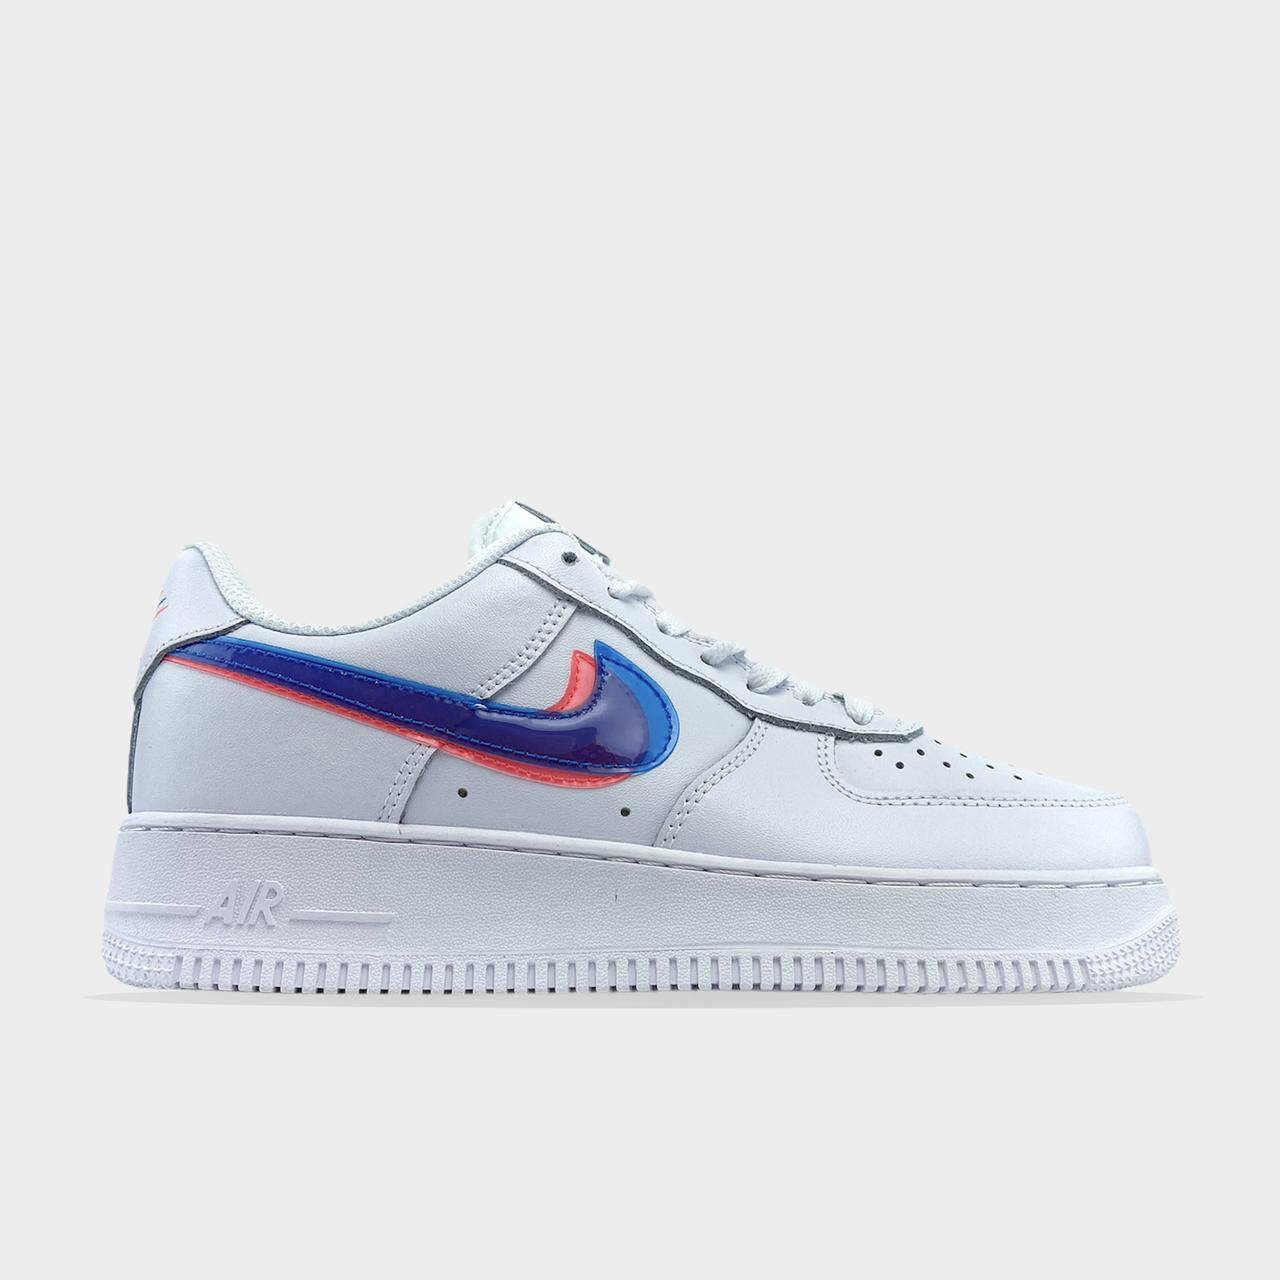 Air Force 1 Low White Blue (Білий)